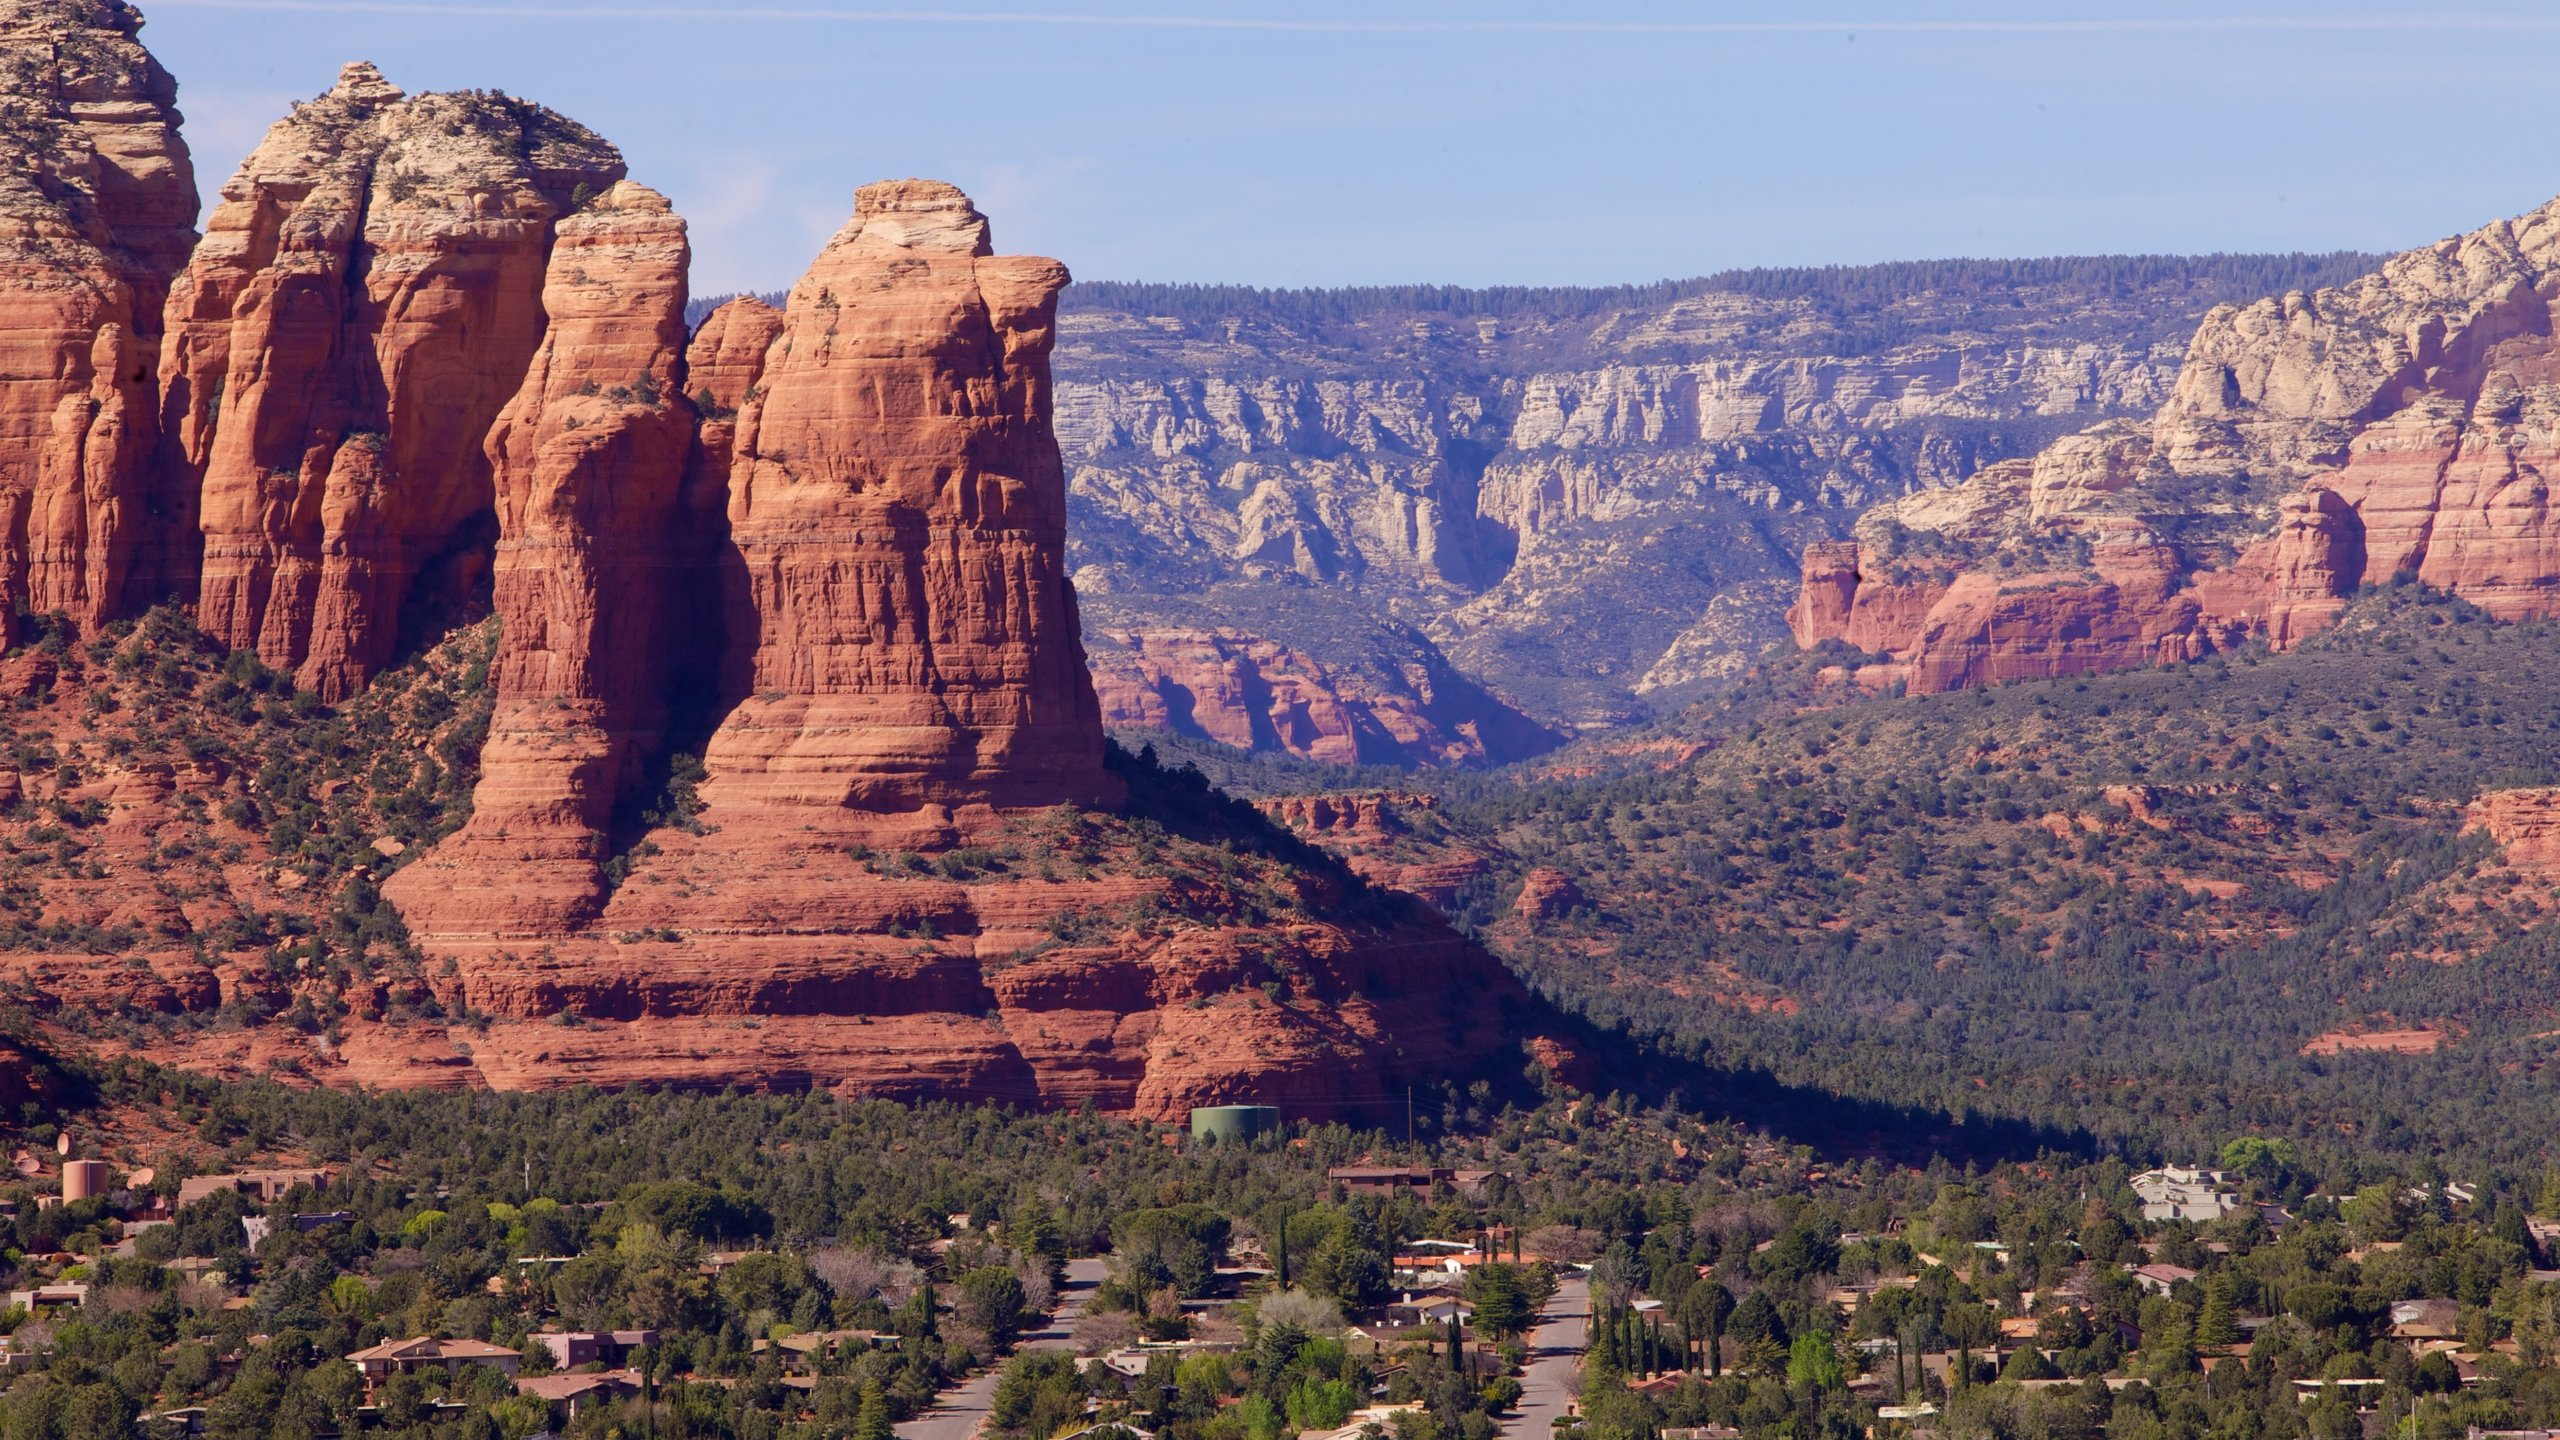 Sedona, Arizona, United States of America